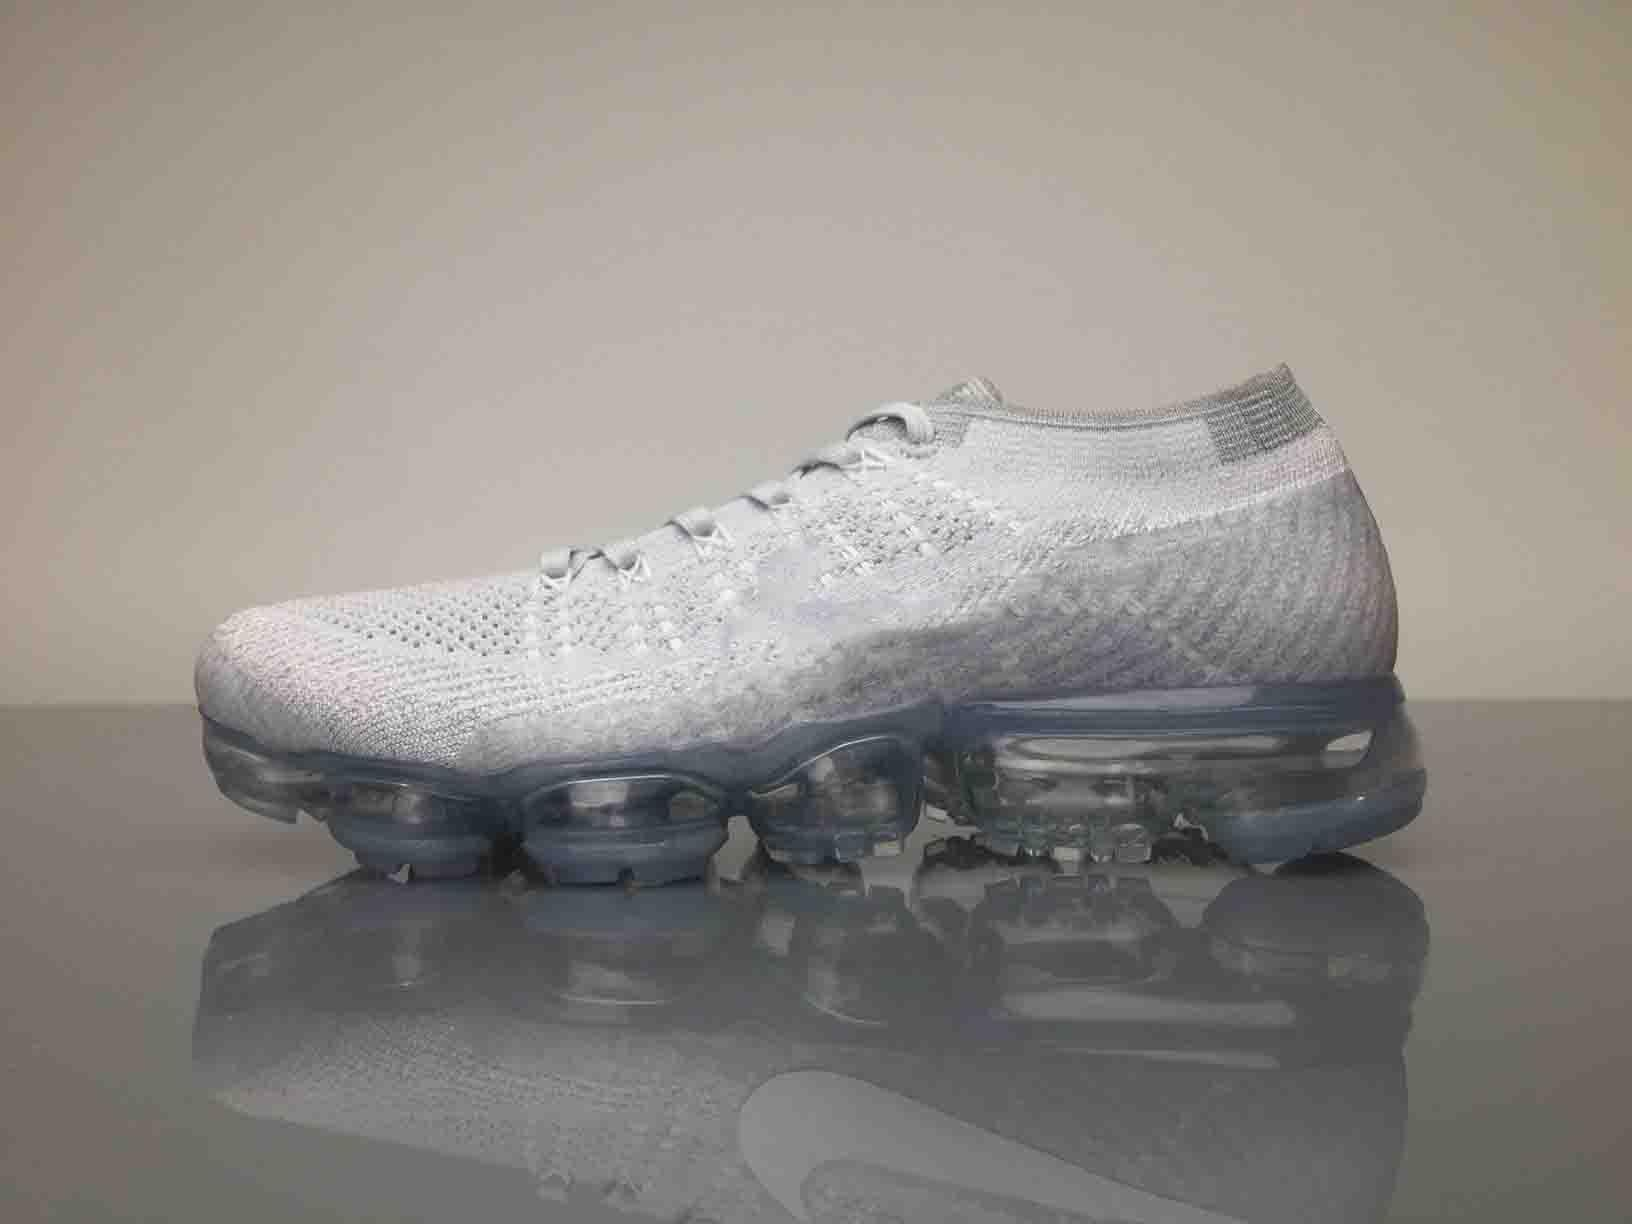 New Air Vapormax 2018 Mens Running Shoes For Men Sneakers Women ... 2111b32a0